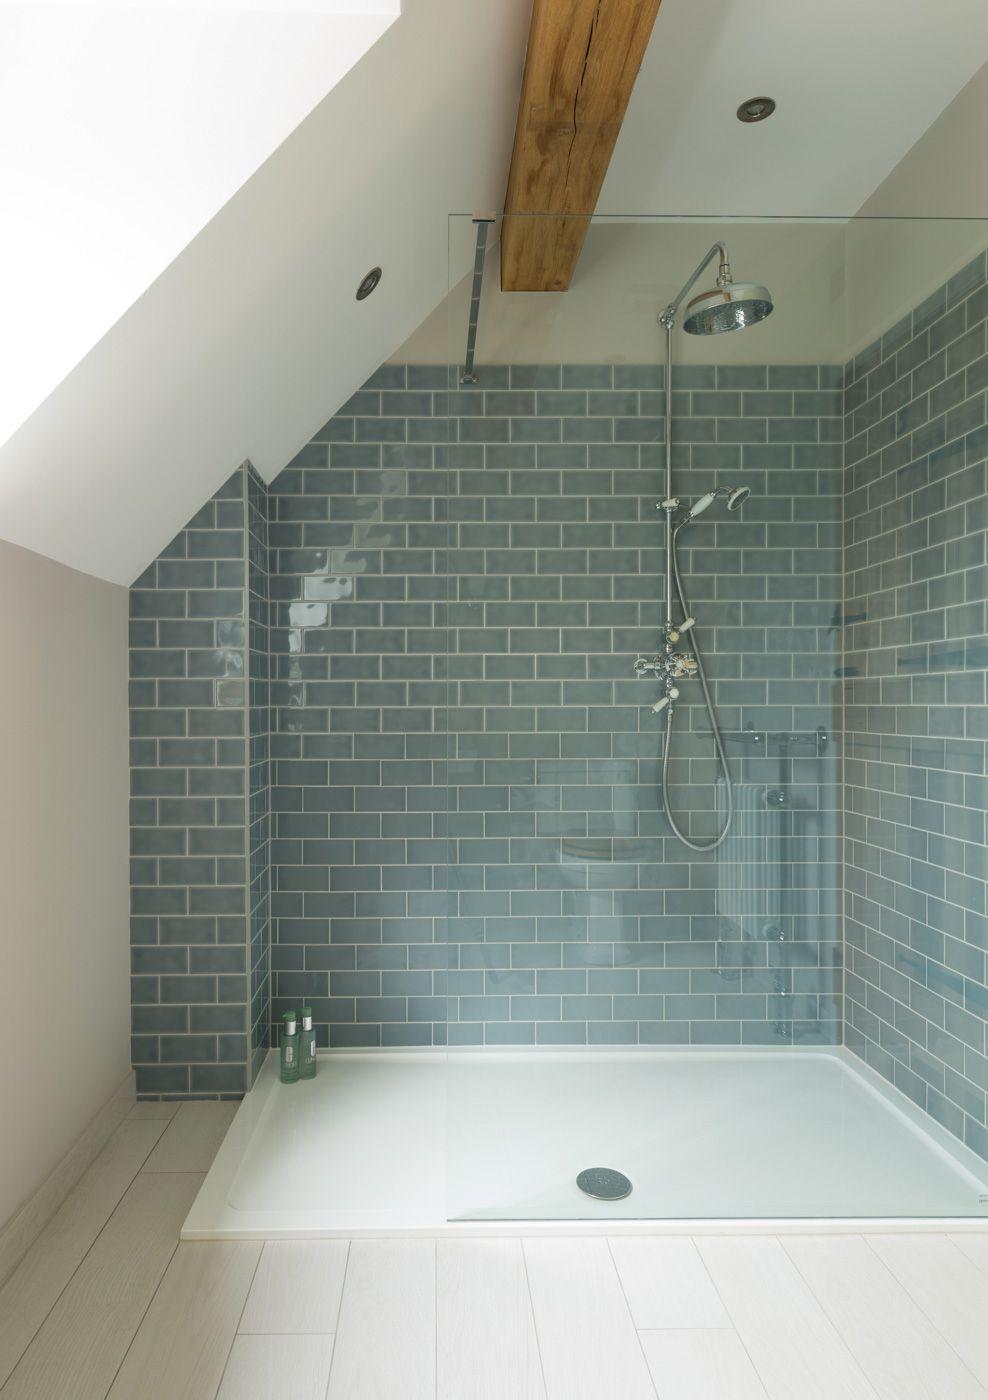 Pin By Alexa Tepass On Border Oak Case Study Westcroft Barn Loft Bathroom Oak Frame House Small Bathroom Remodel